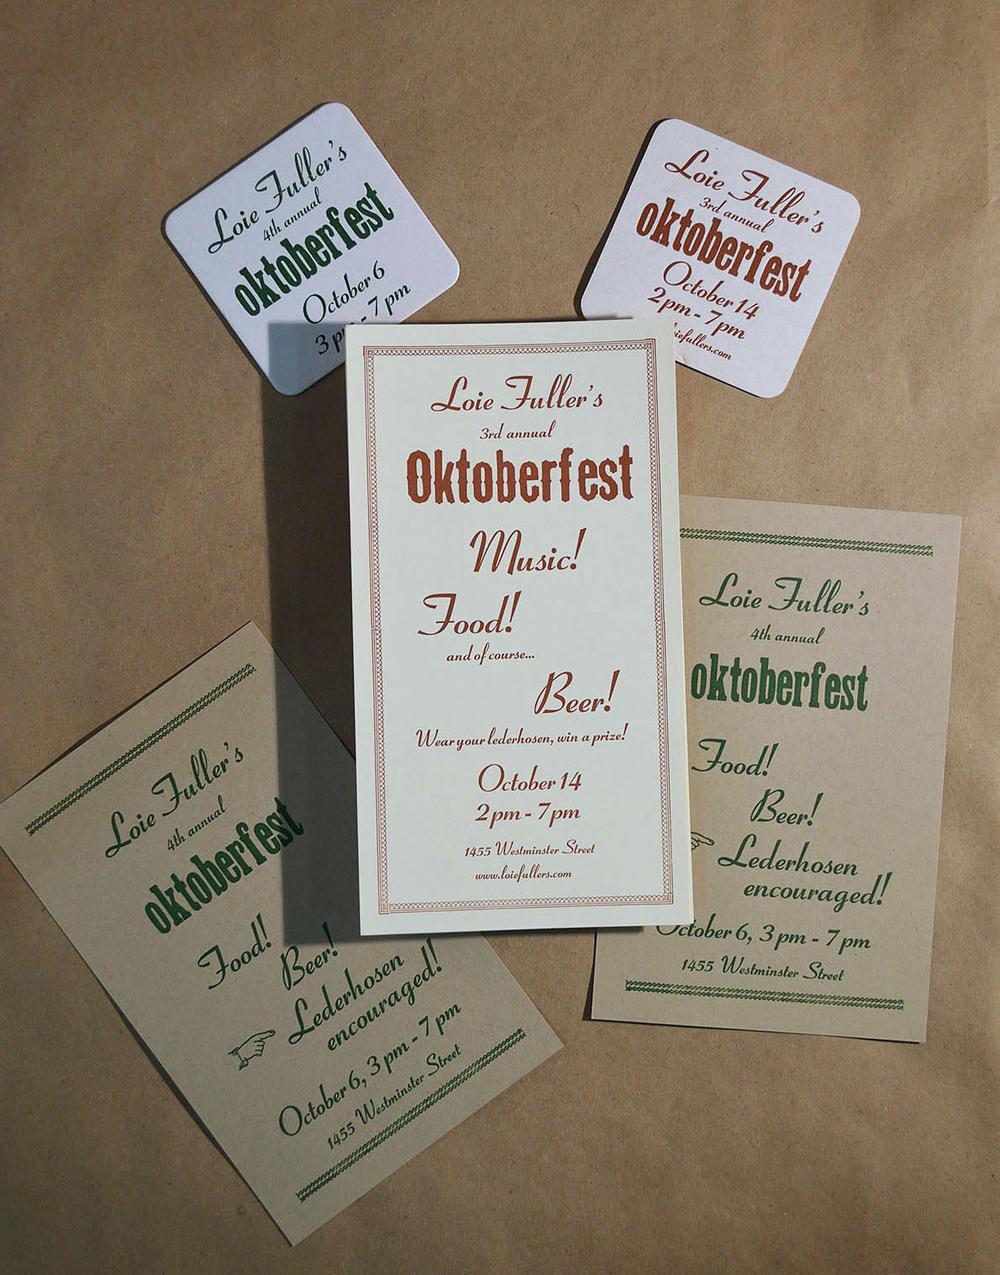 Oktoberfest_DETAIL1.JPG